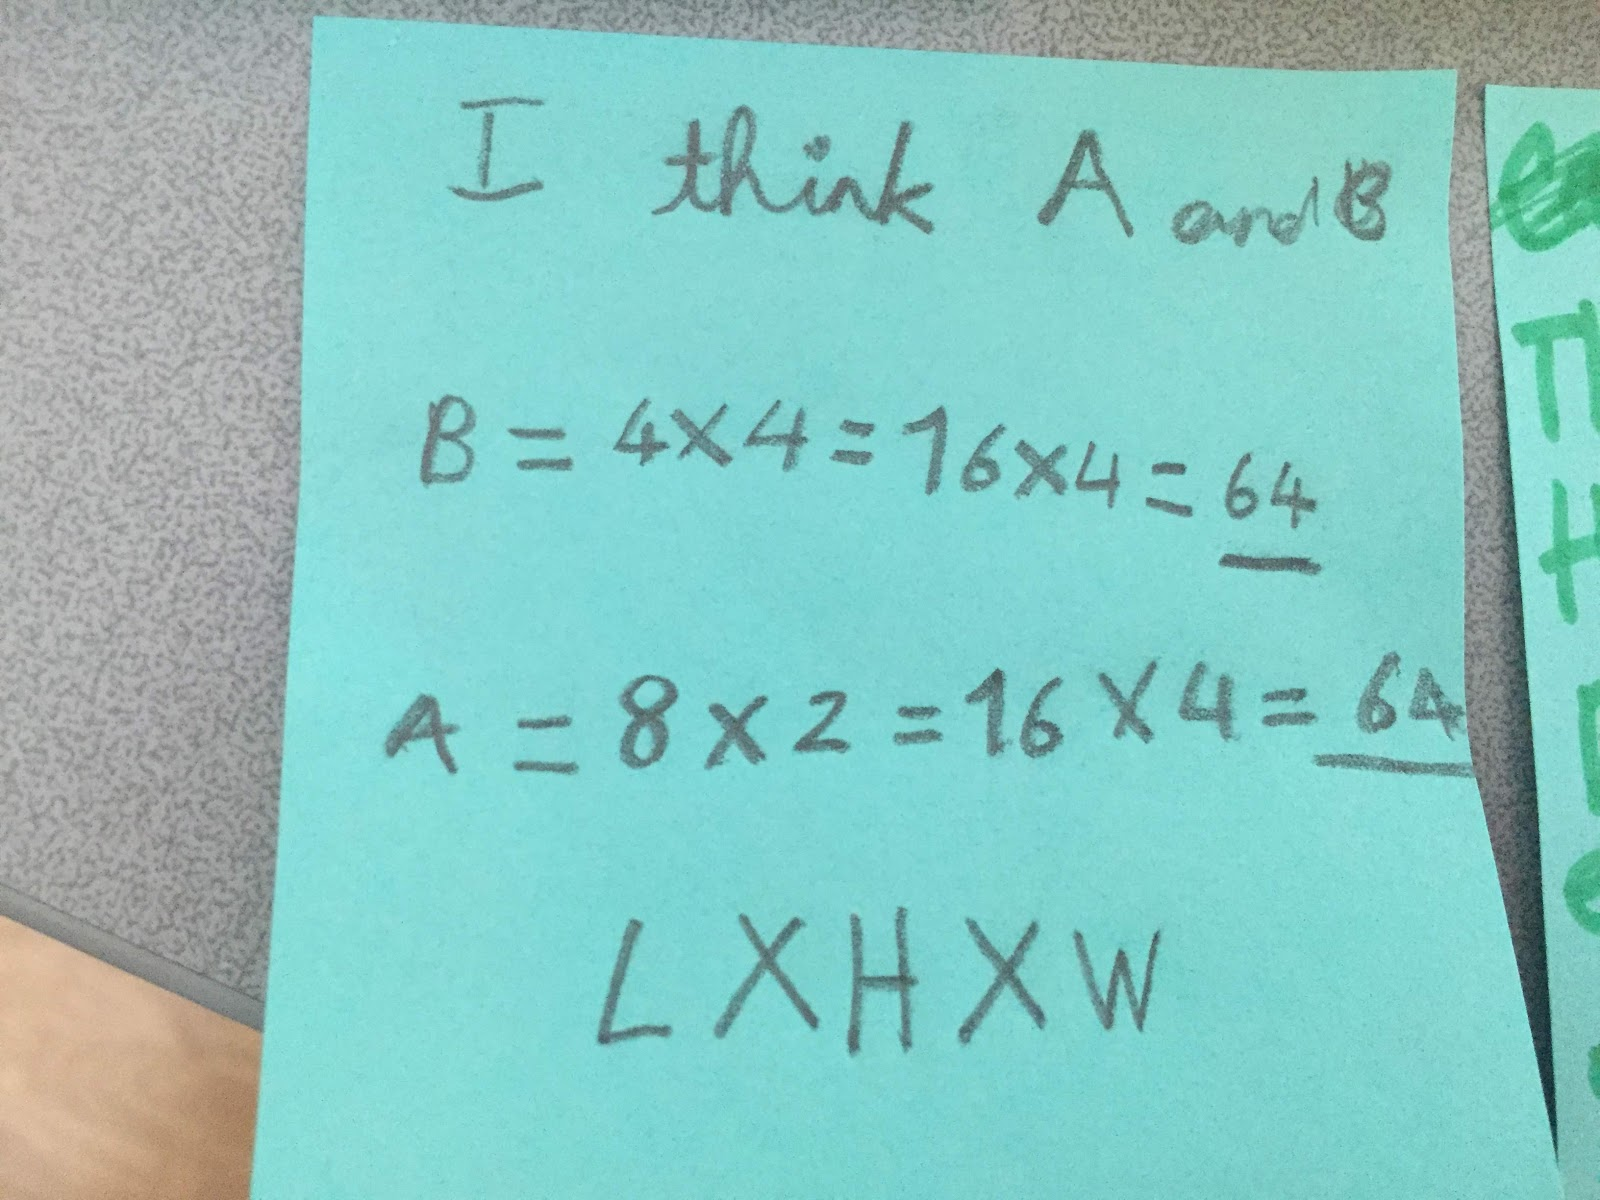 Enquiry-Based Maths